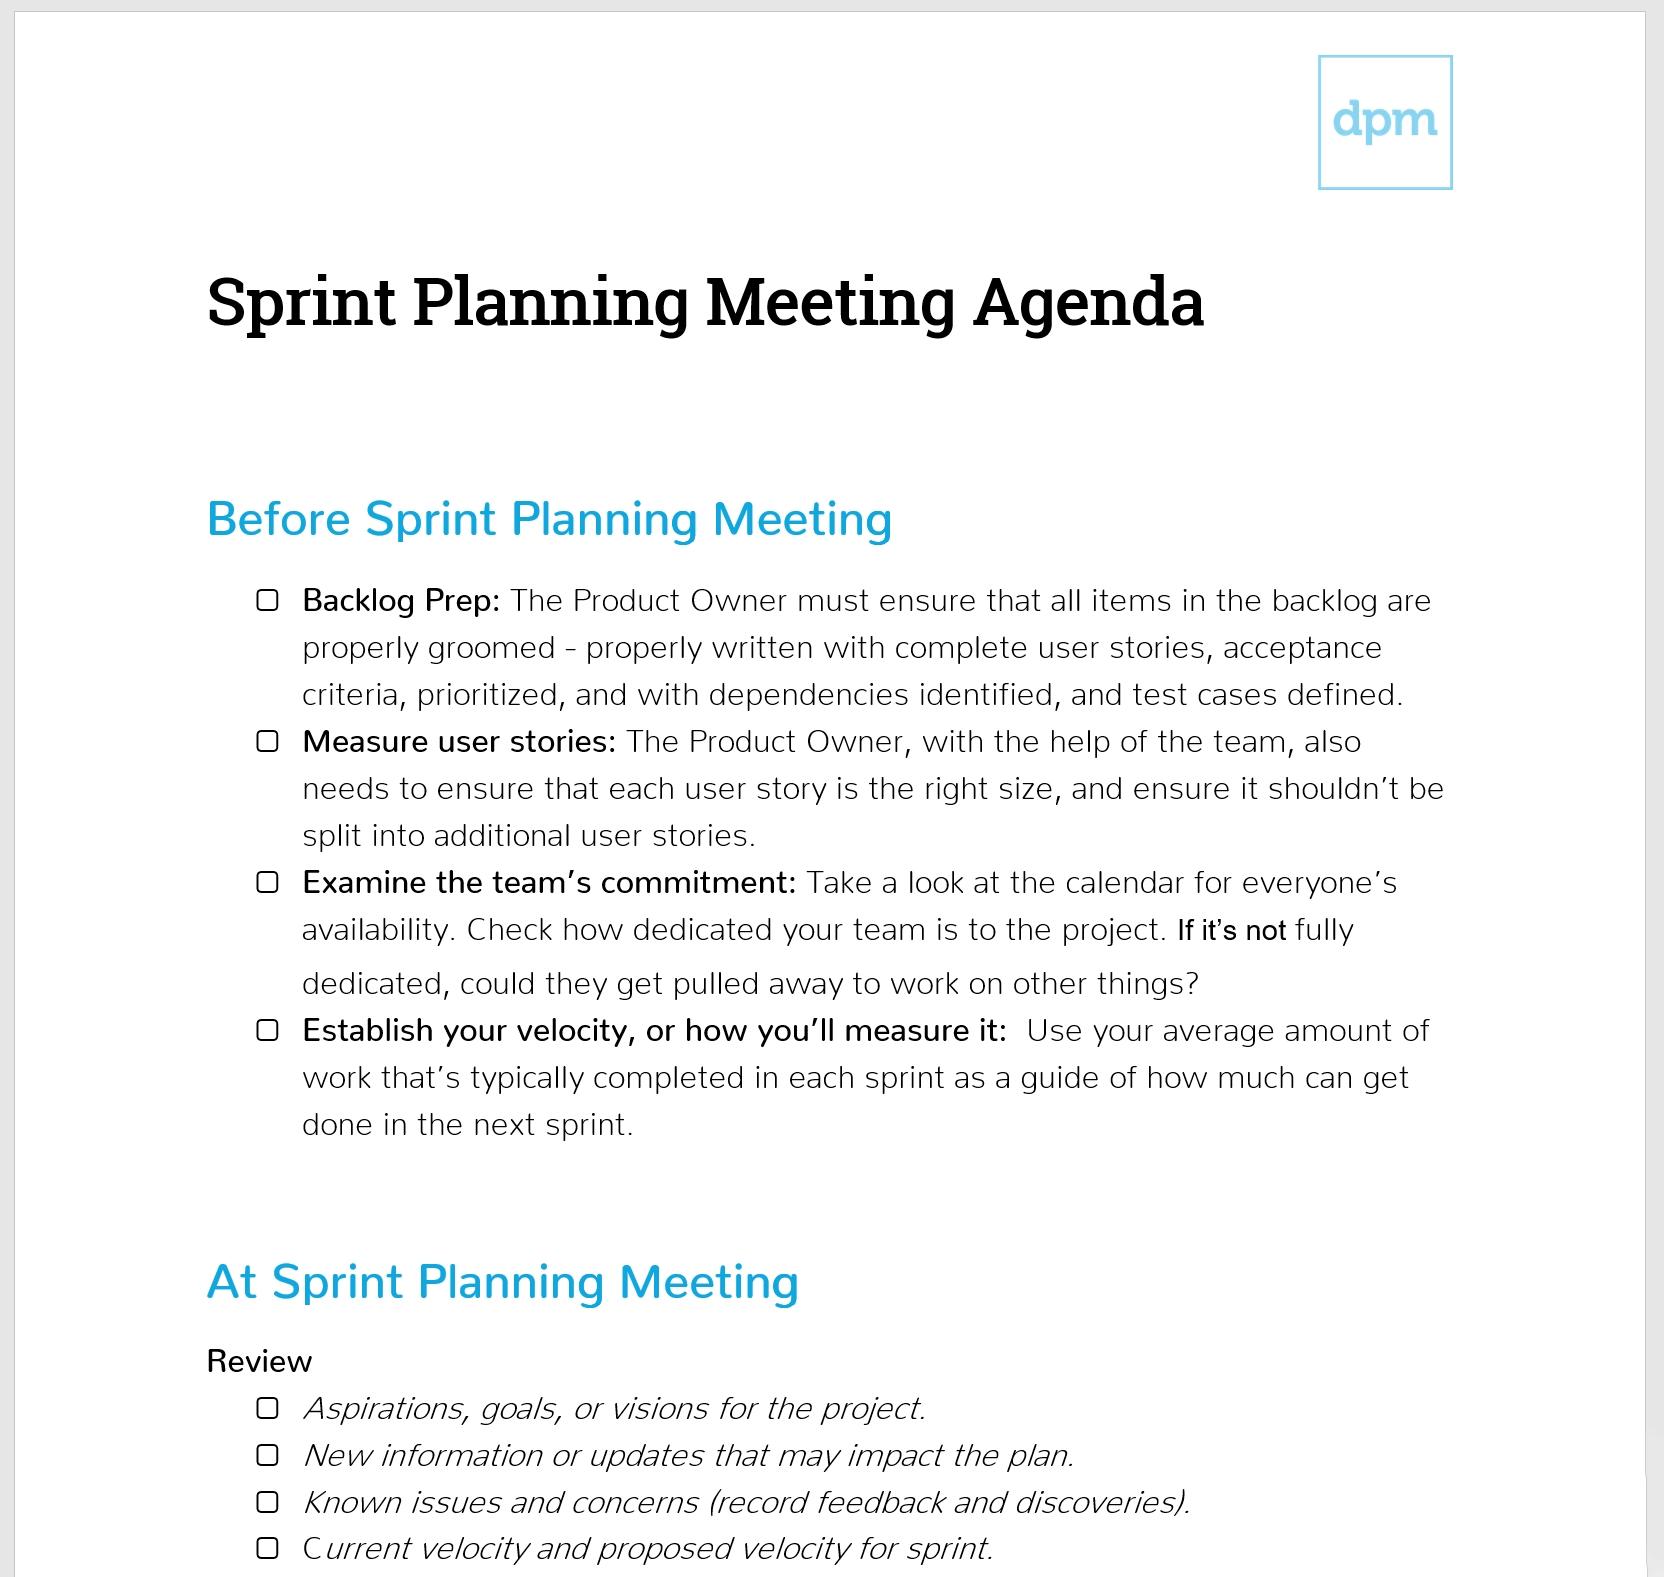 Planning Meeting Agenda Template